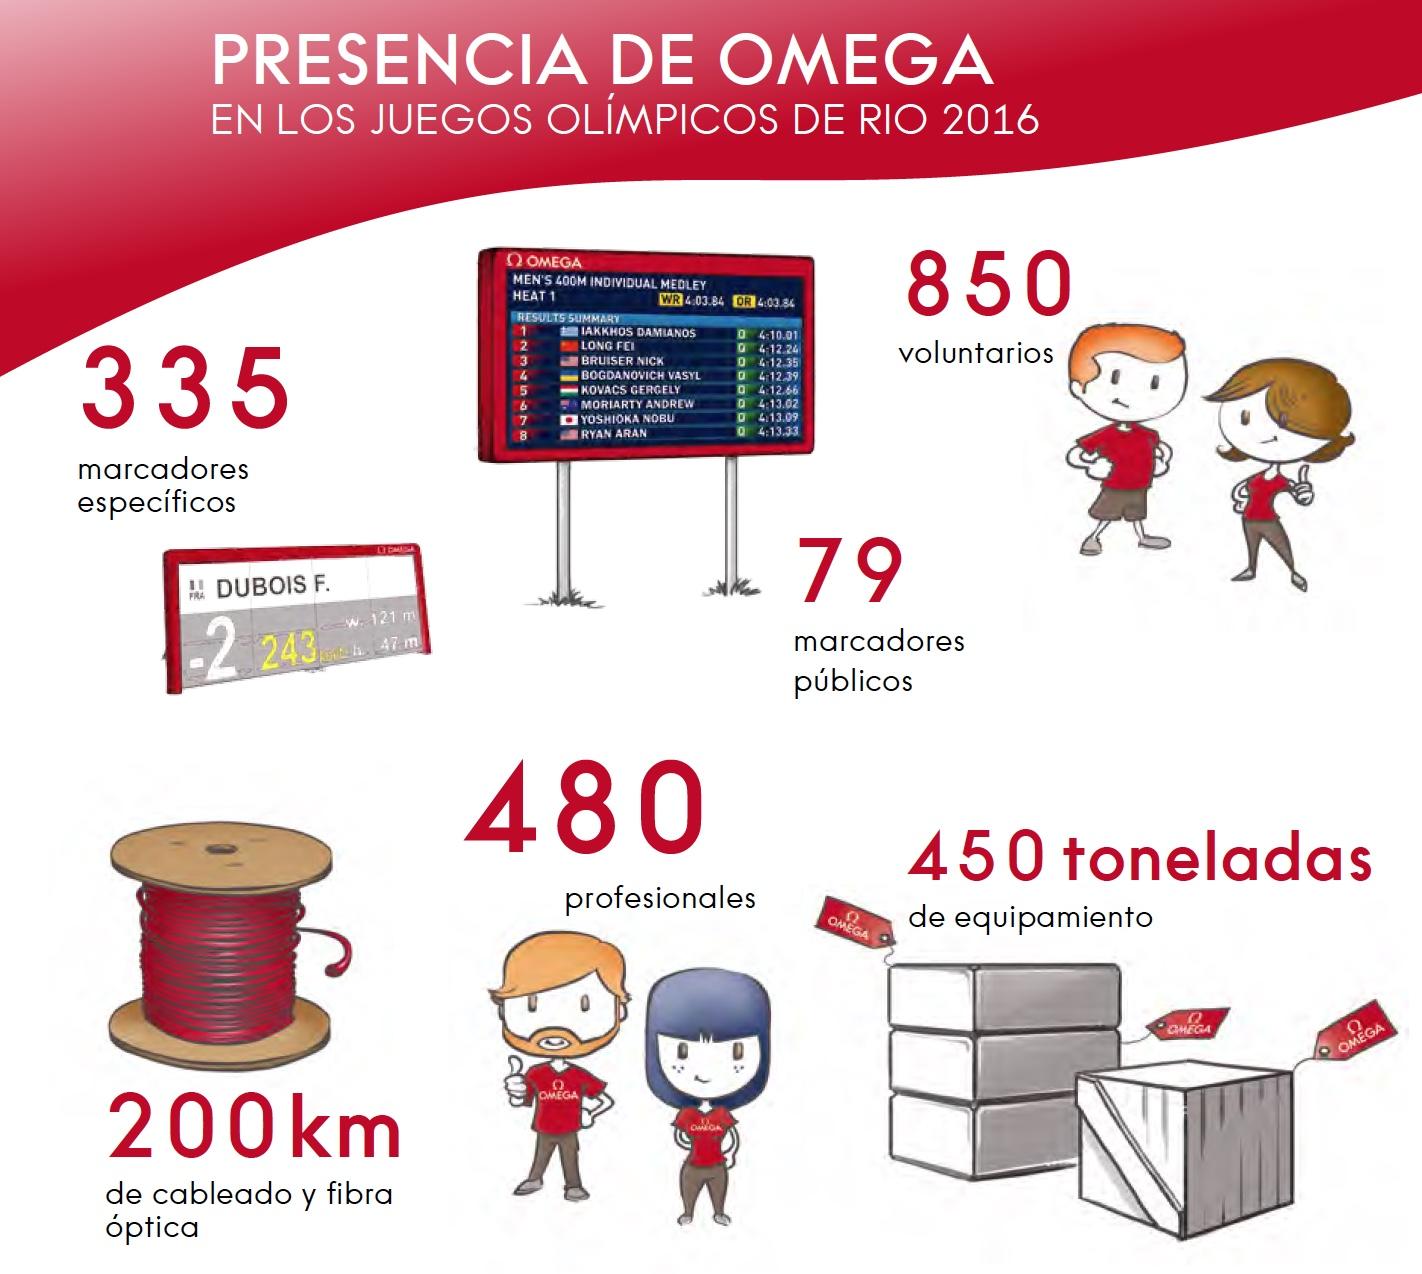 Presencia Omega JJOO RIO 2016